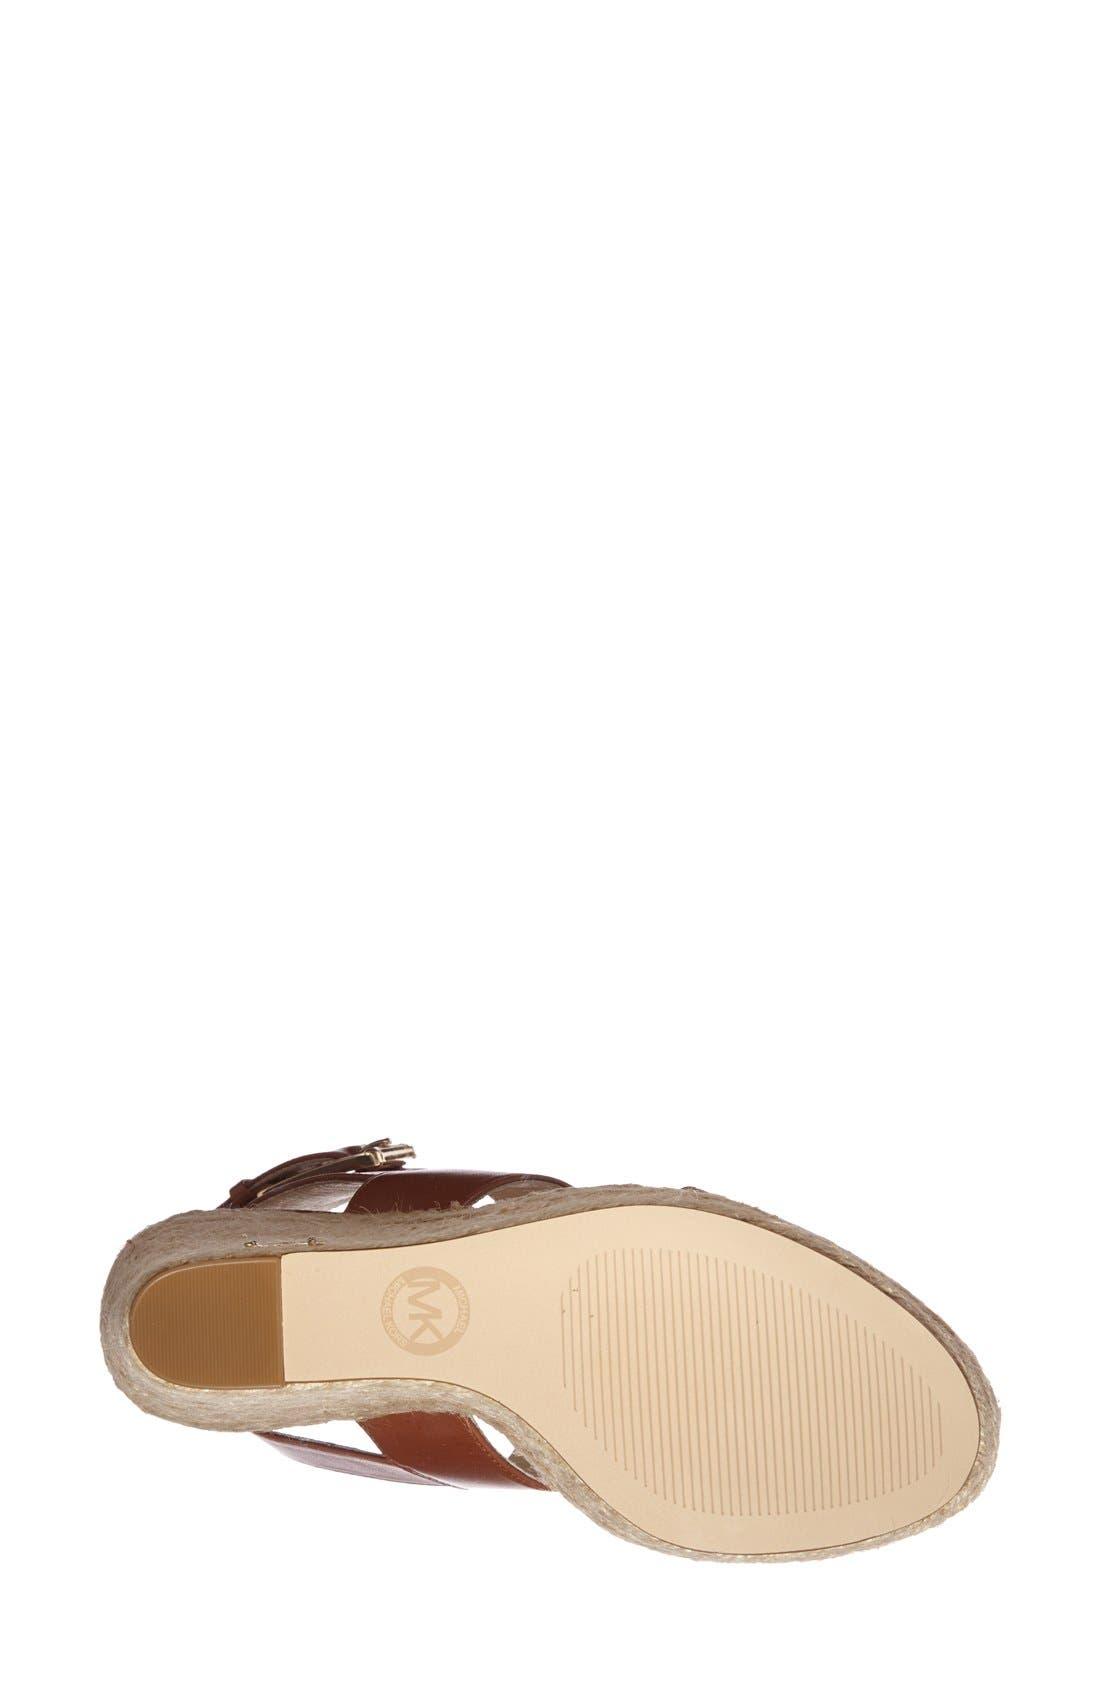 Alternate Image 4  - MICHAEL Michael Kors 'Posey' Ankle Strap Espadrille Wedge Sandal (Women)